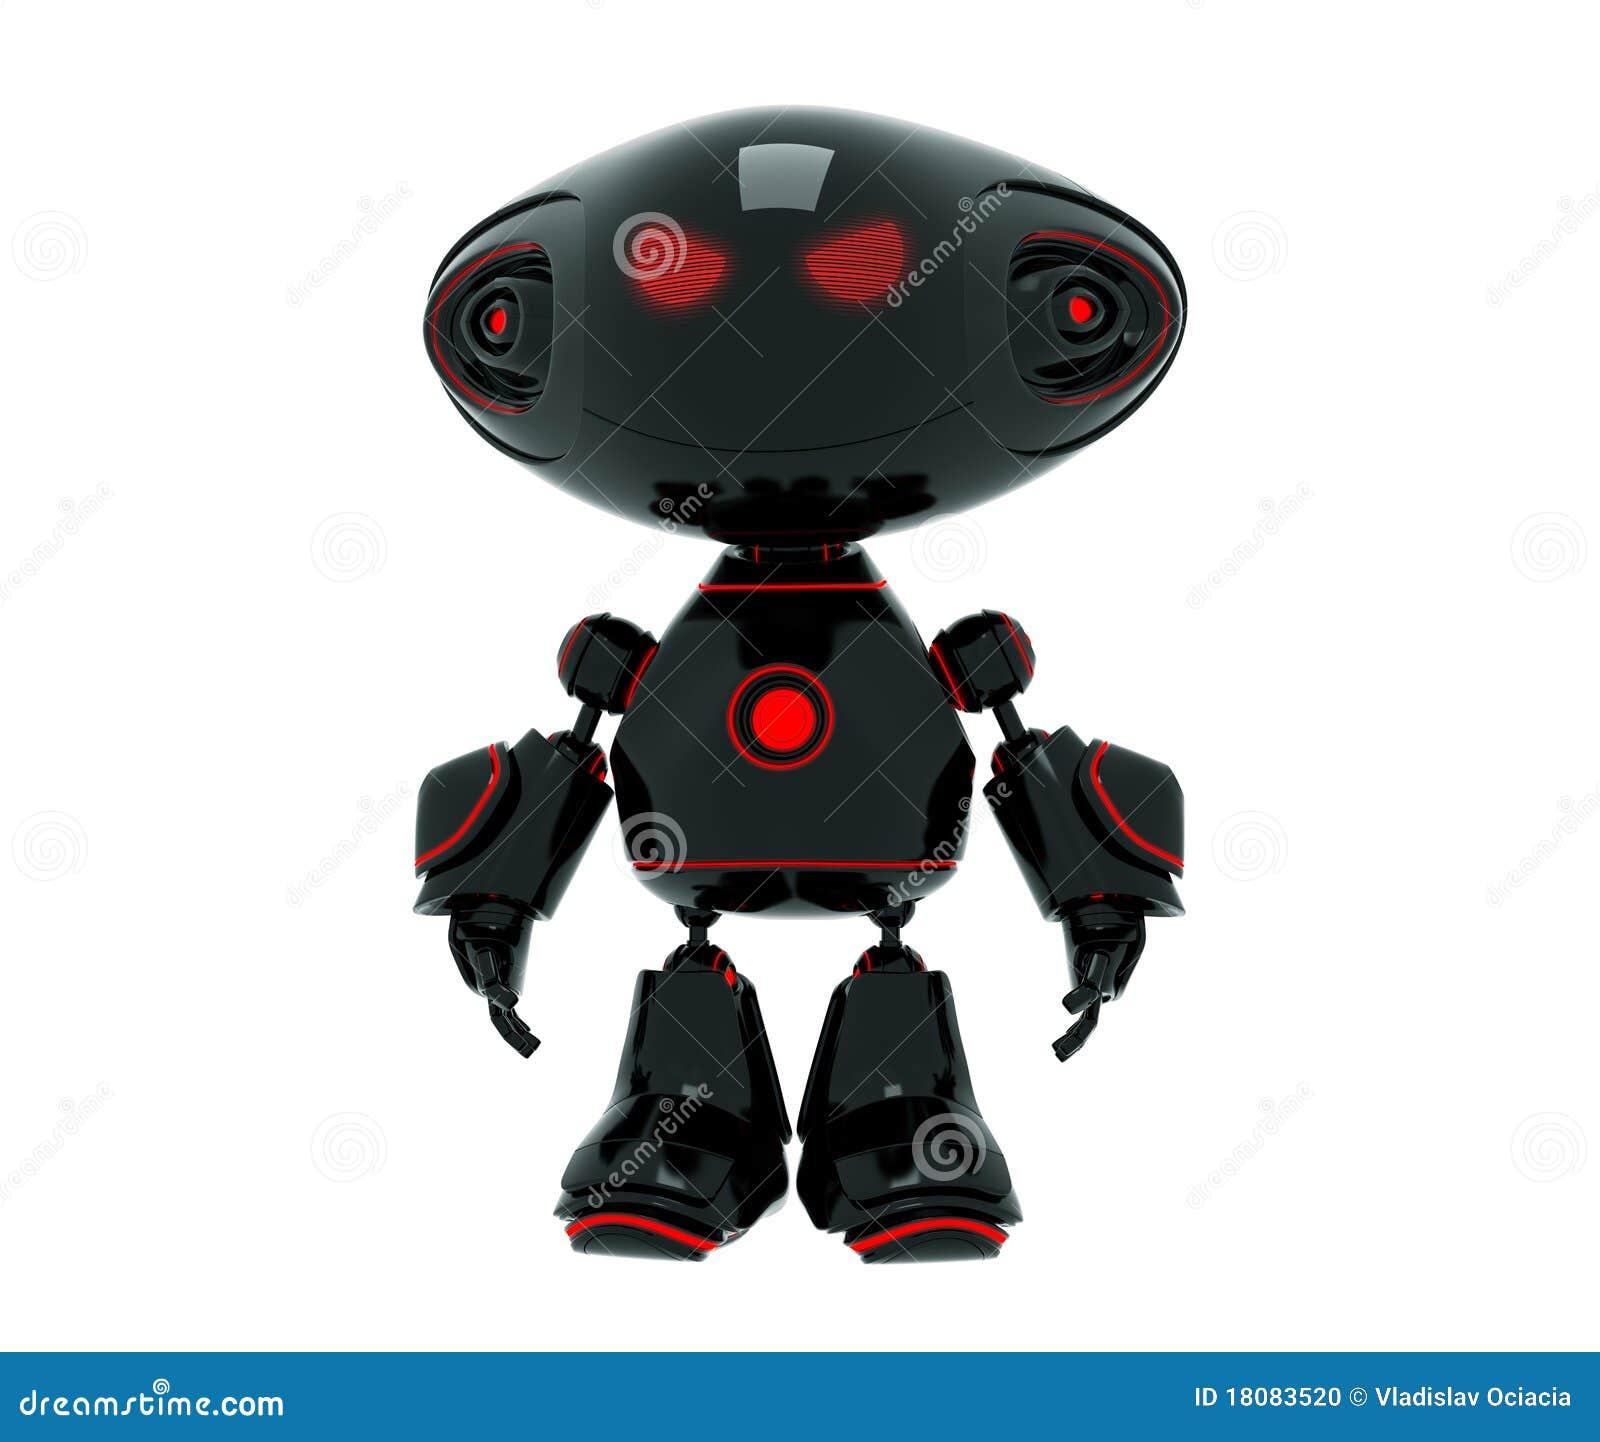 Cartoon Robot Toy : Little cartoon angry robot stock illustration